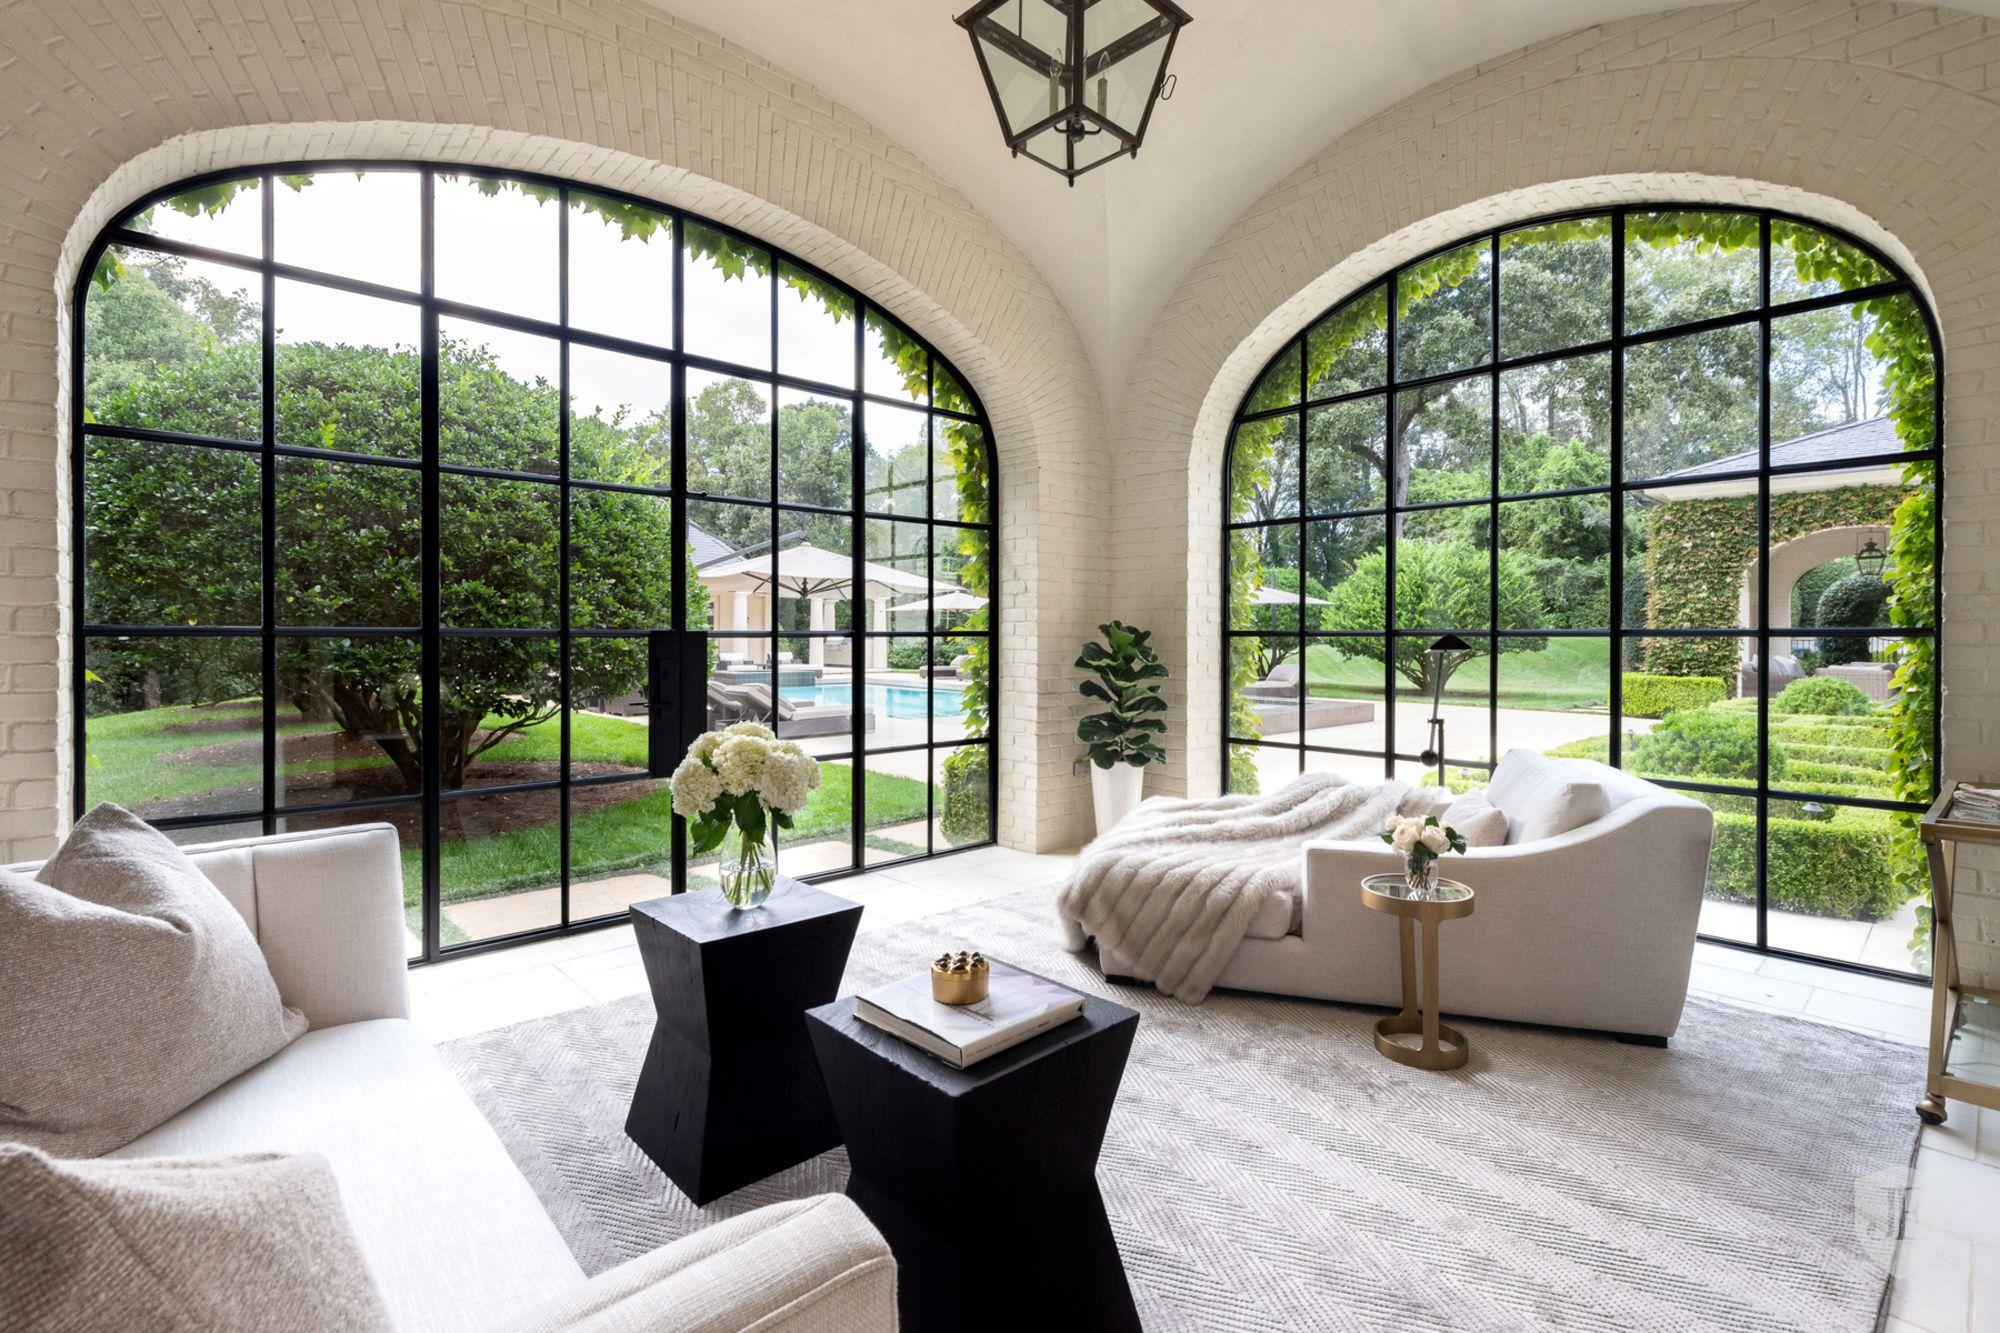 Exquisite Buckhead Estate On 3 8 Private Acres In Atlanta Ga United States For Sale On Jamesedition In 2020 Luxury Homes Dream Home Design House Design